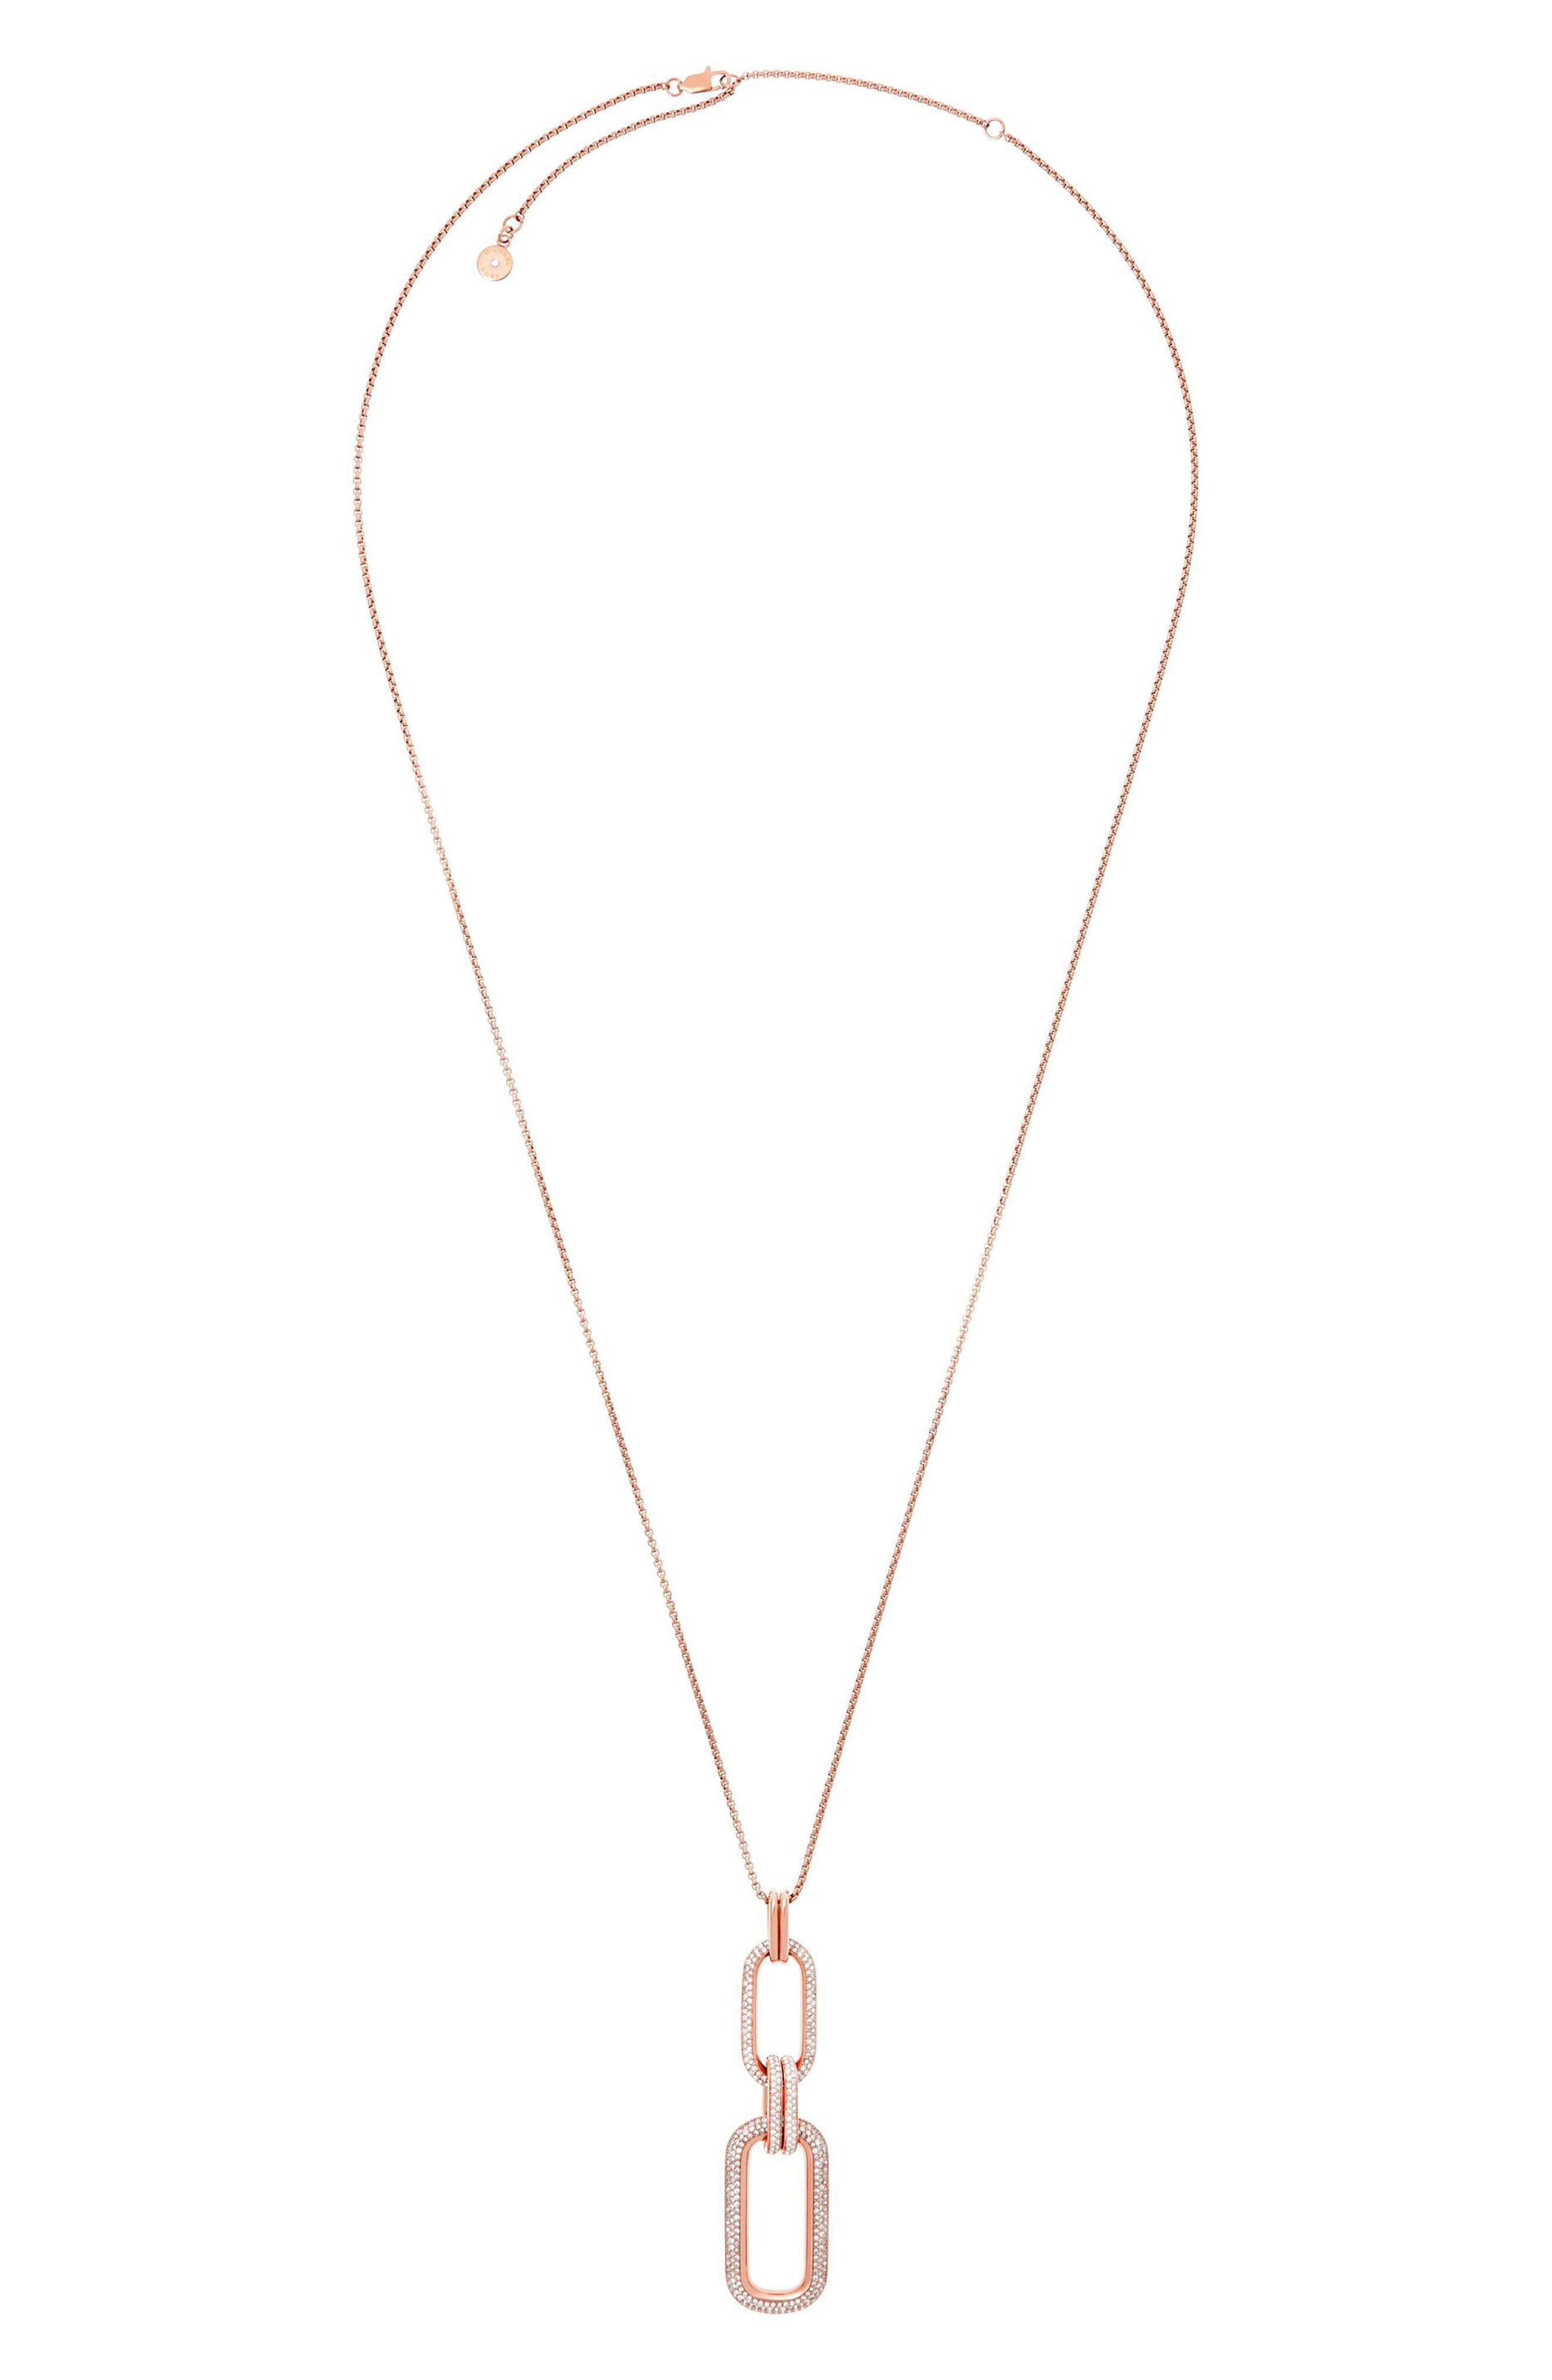 Alternate Image 1 Selected - Michael Kors Pendant Necklace